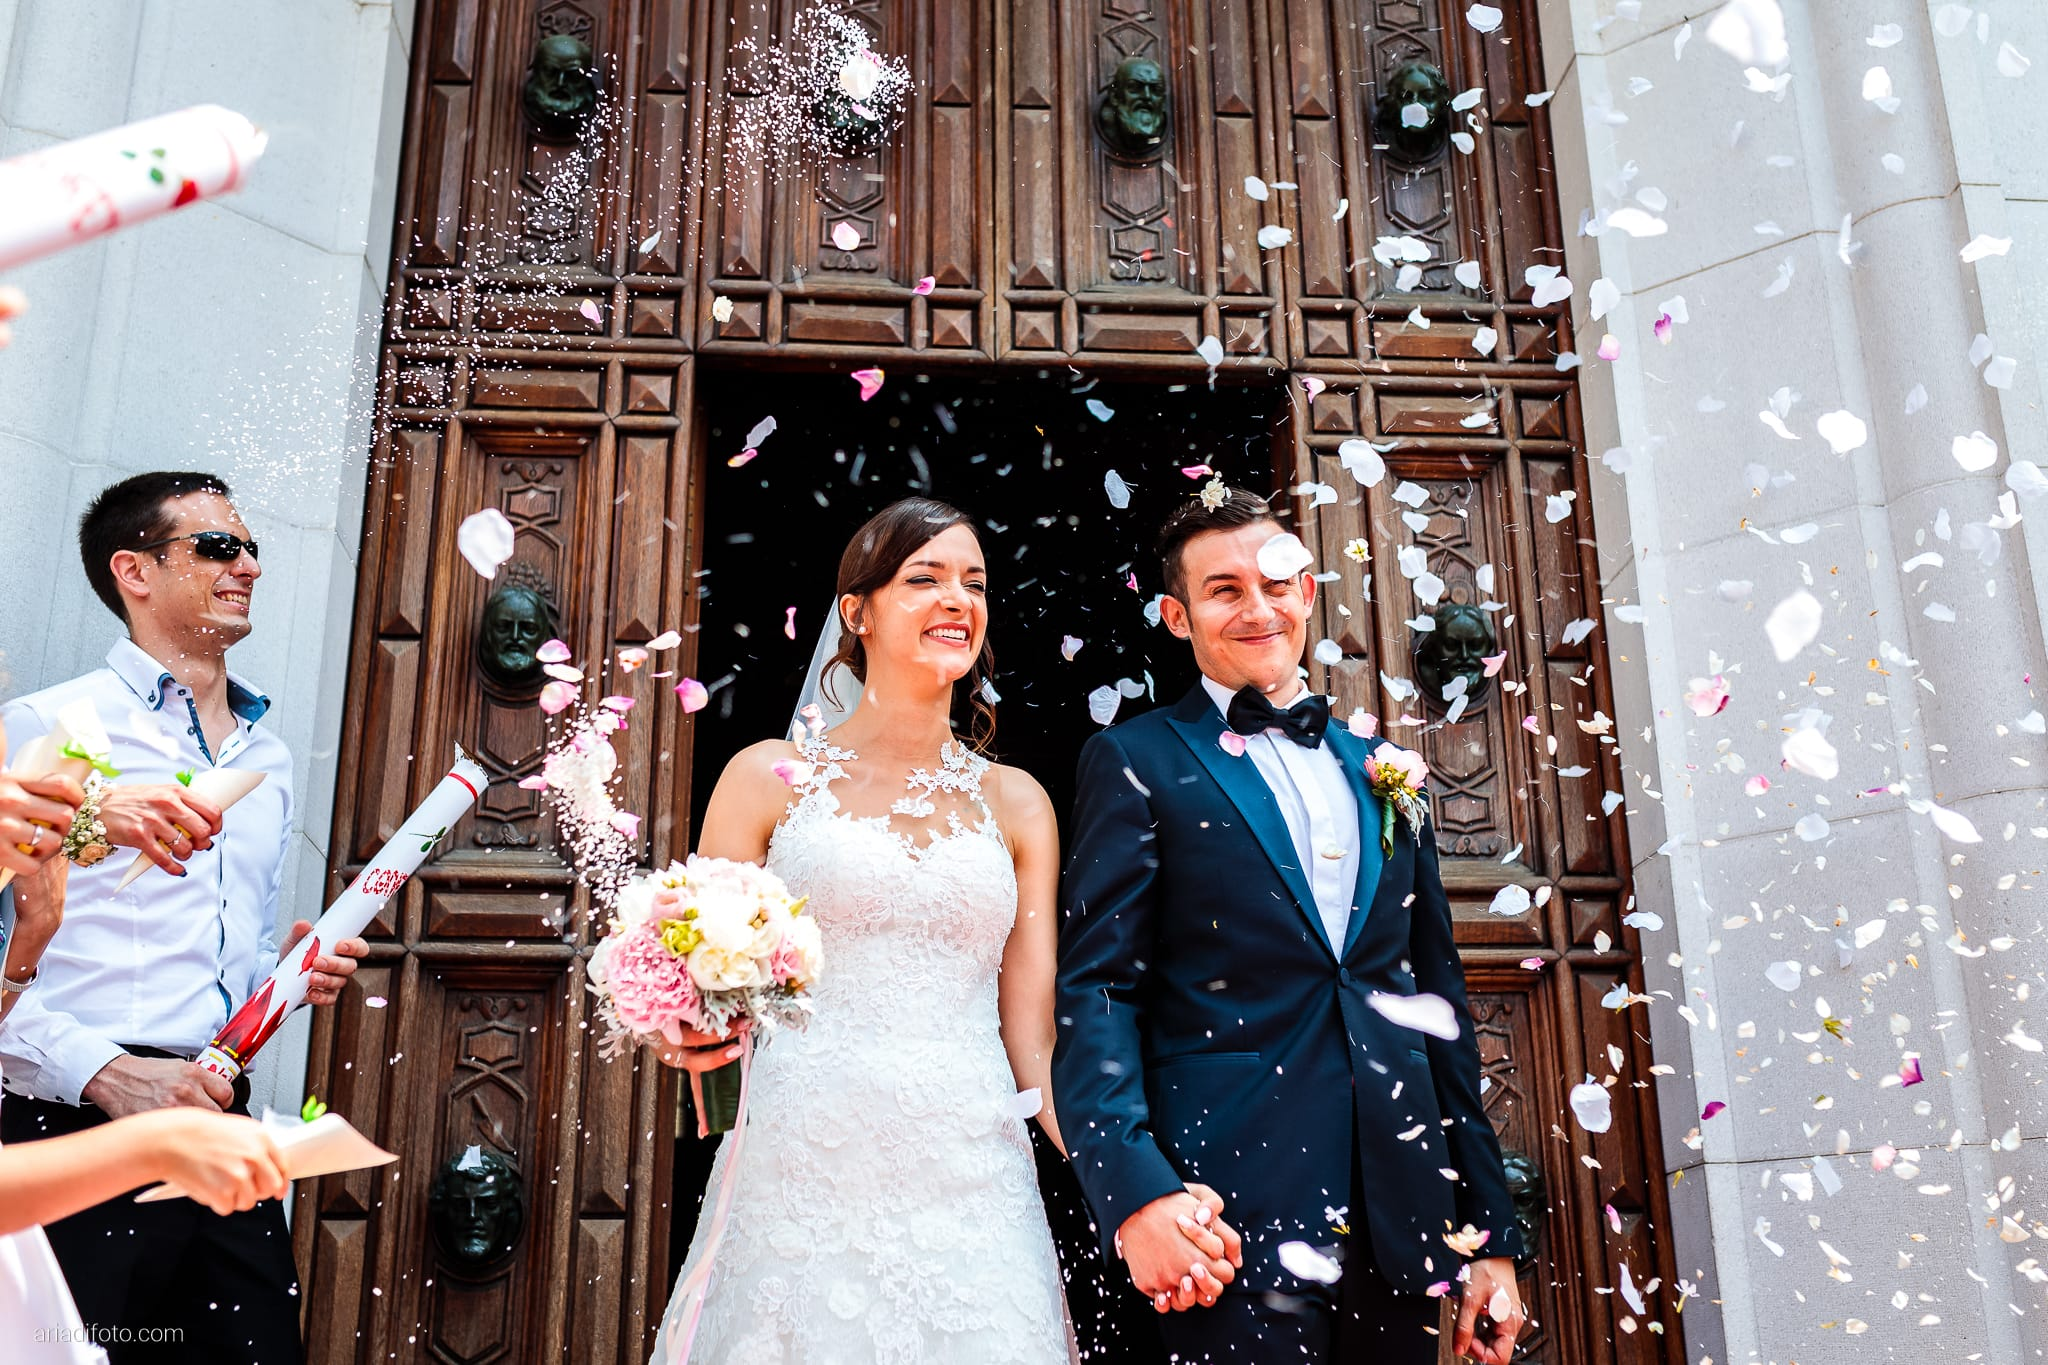 Valentina Marco Matrimonio Duomo Gorizia Castelvecchio Sagrado cerimonia cattolica lancio del riso